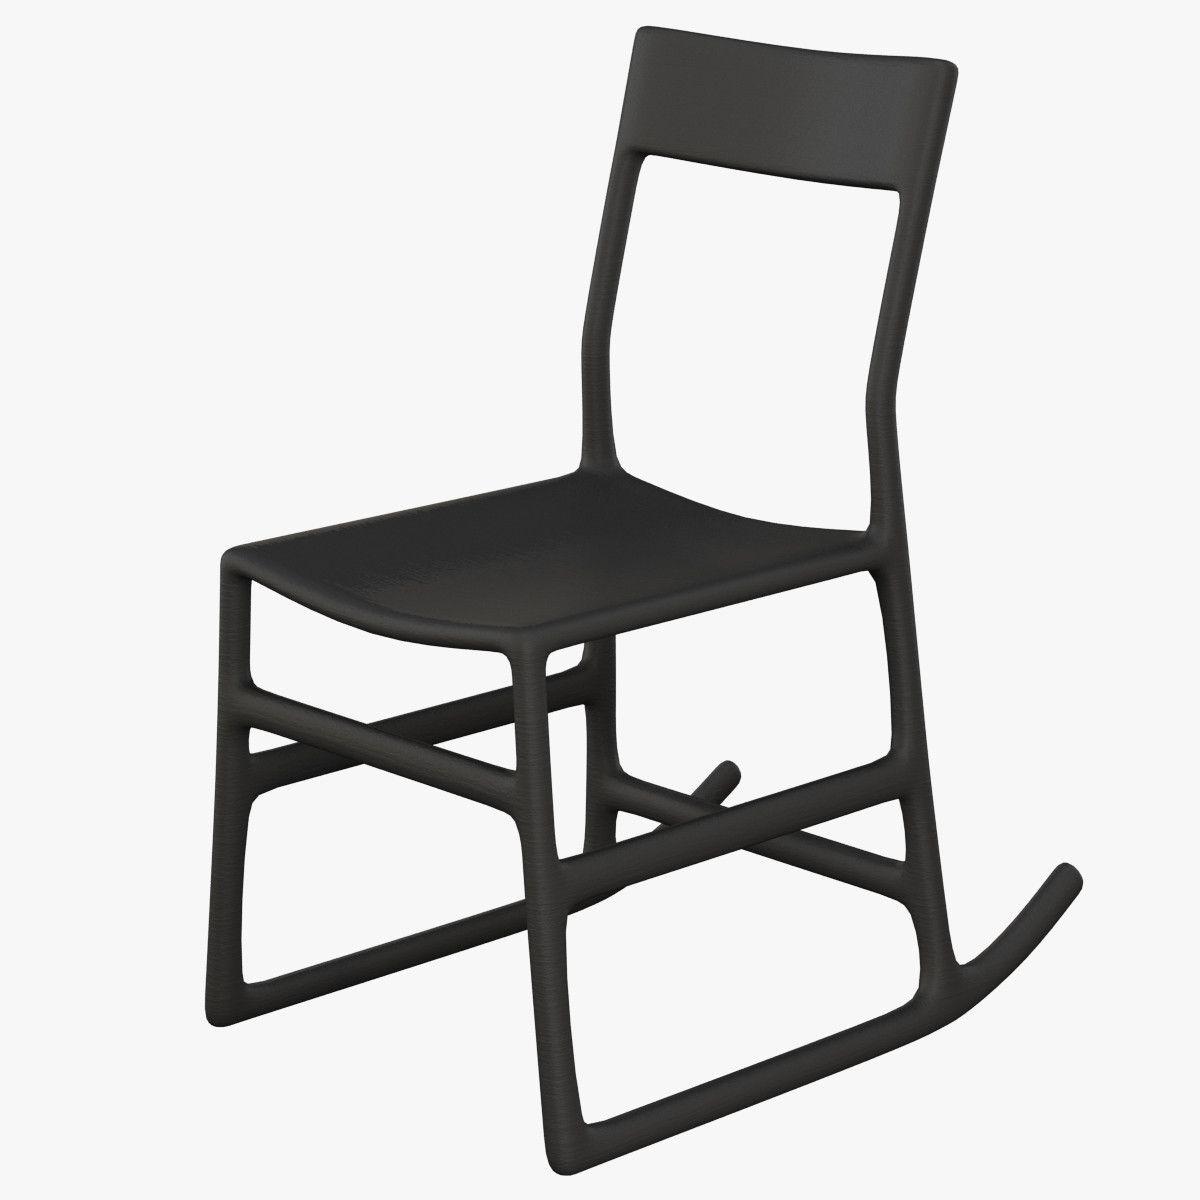 Ikea Outdoor Rocking Chair - Ps ellan 2005 by chris martin for ikea